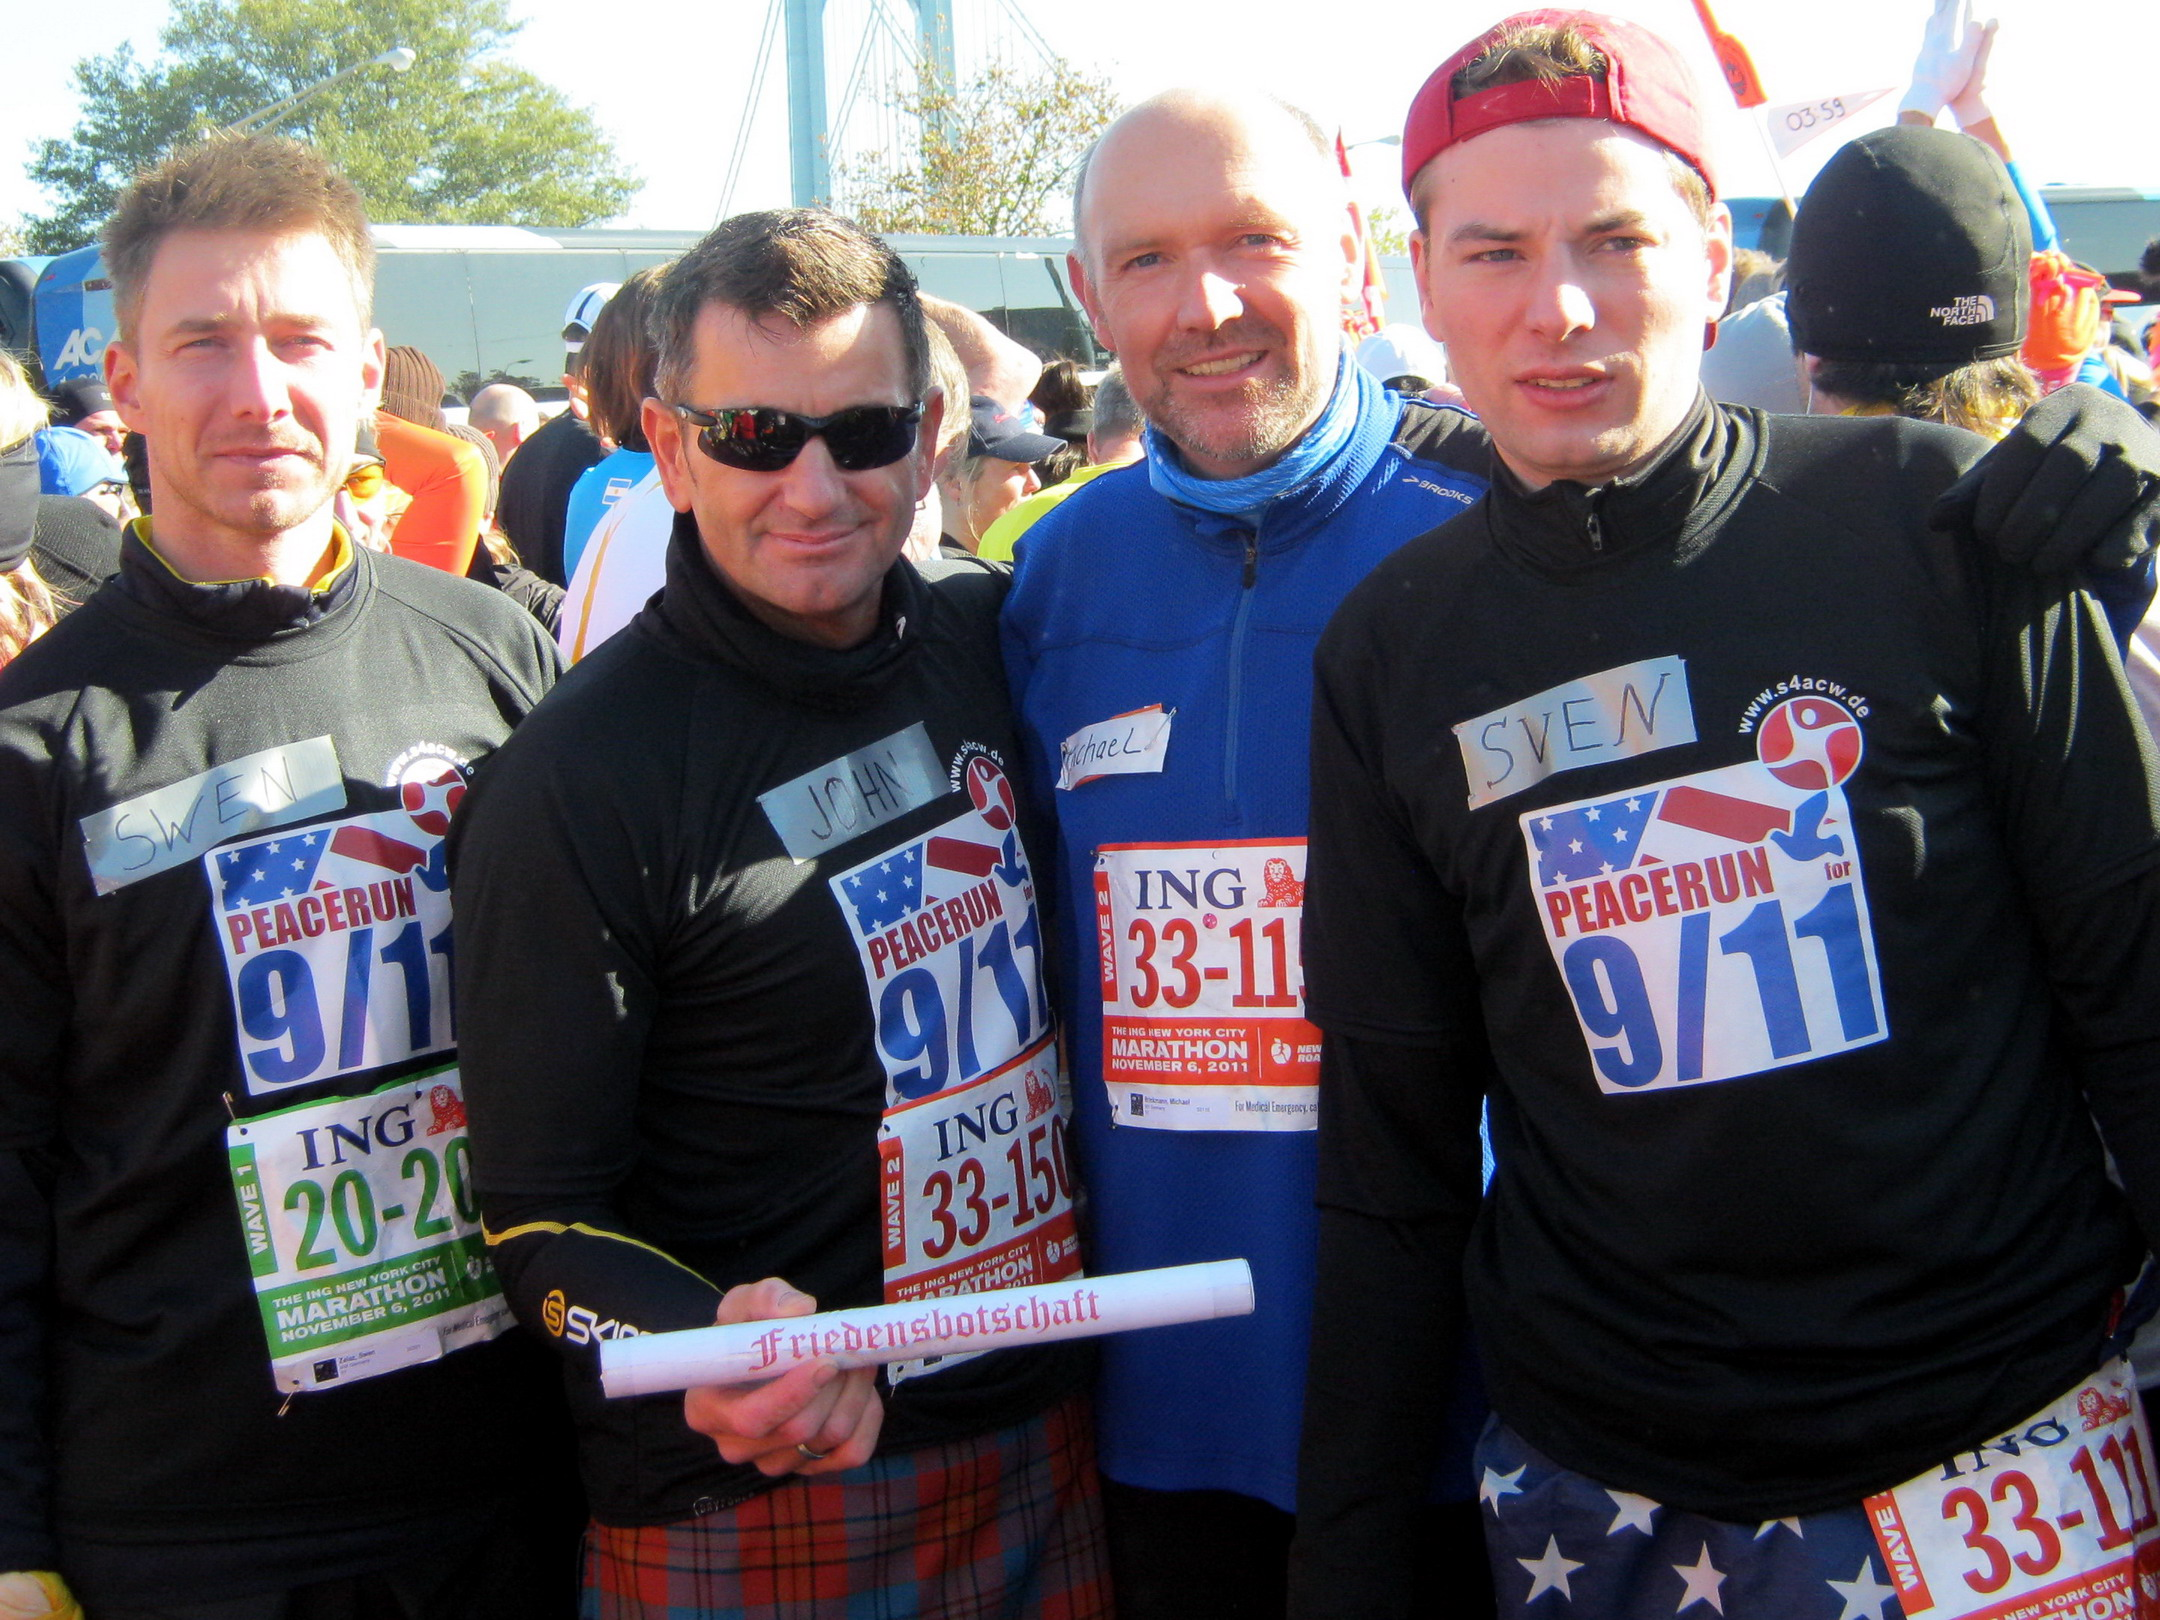 2011-11-06-ny-sz_jmg_mb_sk-vor-dem-marathon_bildgroesse_aendern